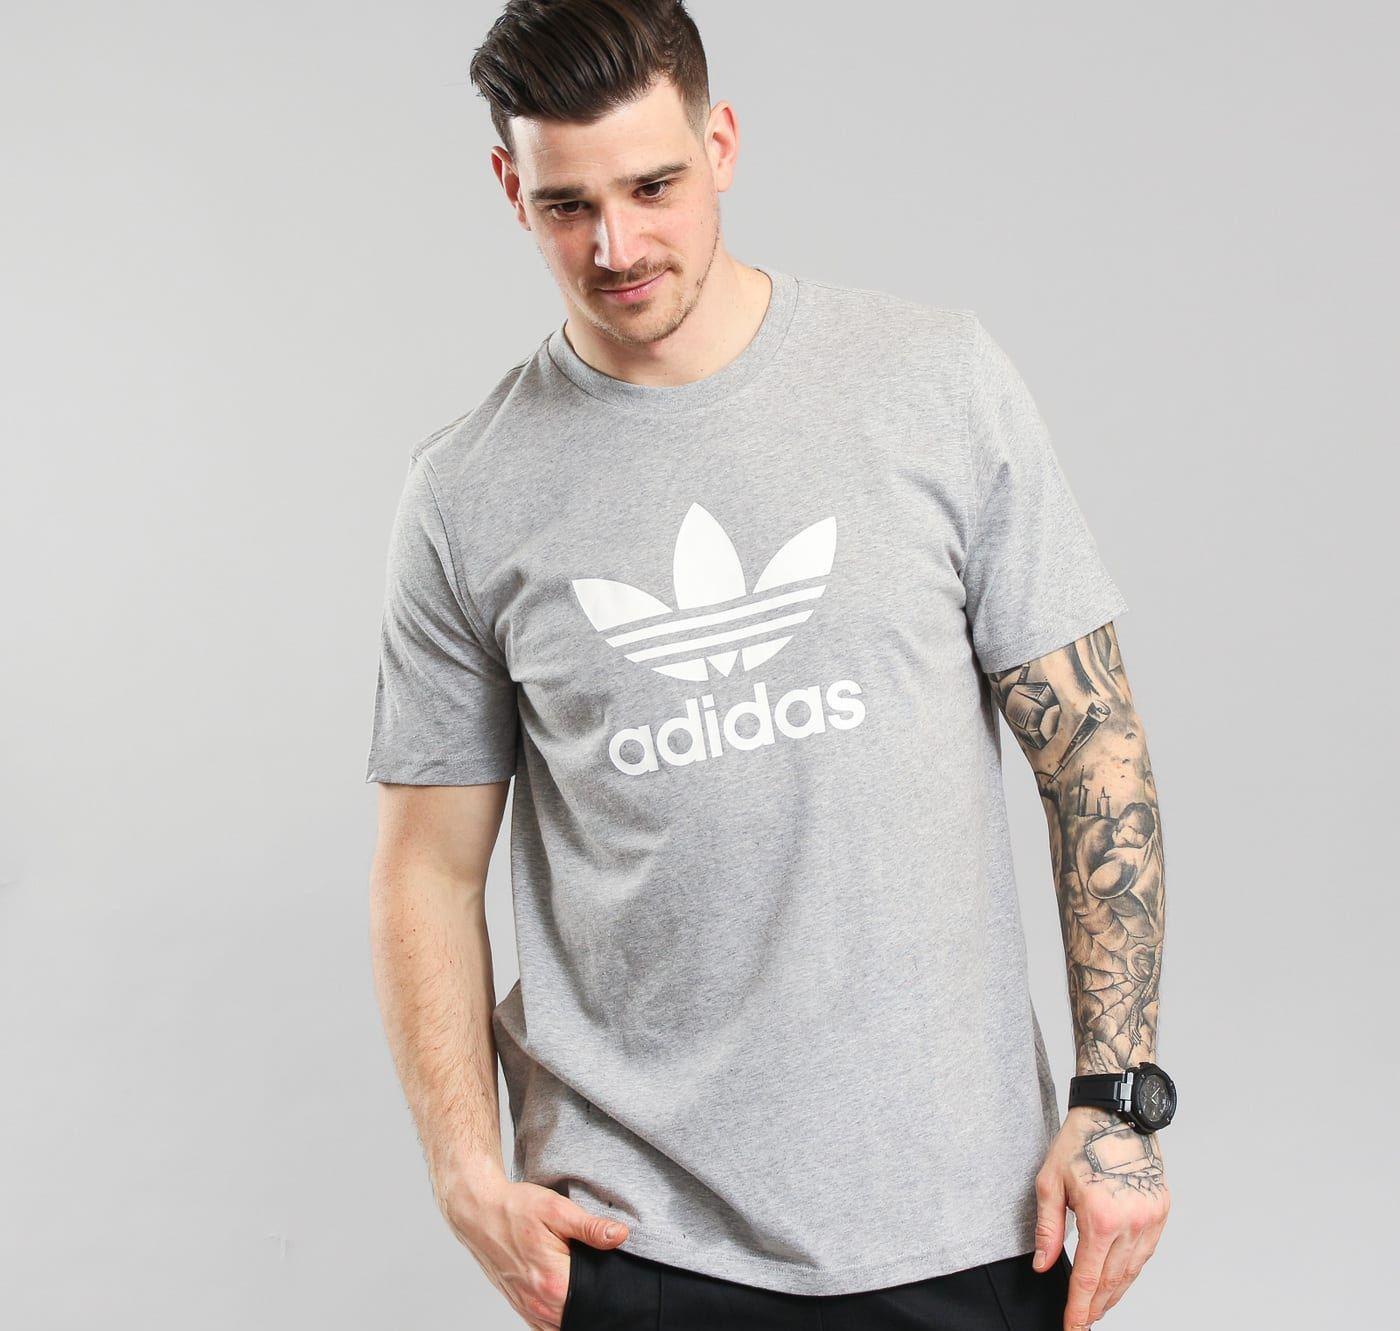 Details about Adidas Originals Men's Short Sleeve Grey Heather Trefoil T Shirt S M L XL XXL